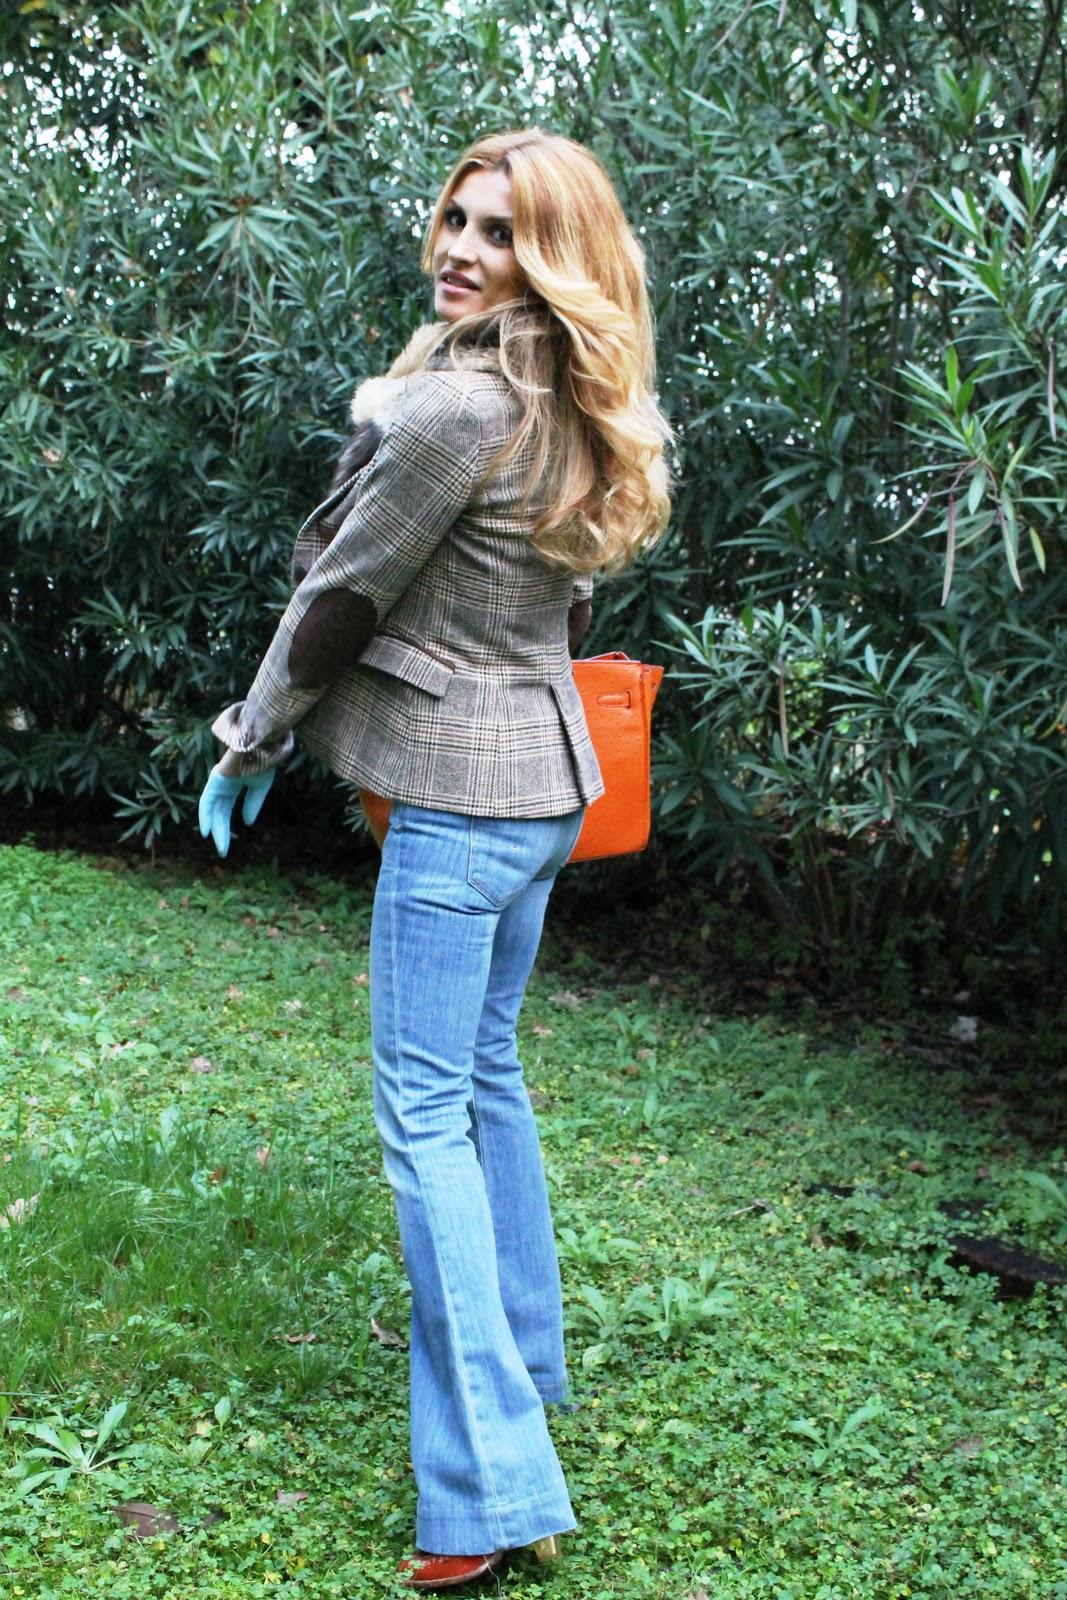 http://1.bp.blogspot.com/-oCWdmt_lGLA/TtT07SmUQYI/AAAAAAAACKk/yXj655CH7RQ/s1600/blonde_girl_hermes_birkin_ragazza_bionda_con_porsa_collo_di_pelliccia_fur_faux_gloves_jeans_zara_dolce_e_gabbana_hermes_belt_prada_zara_jacket_giacca-10.JPG